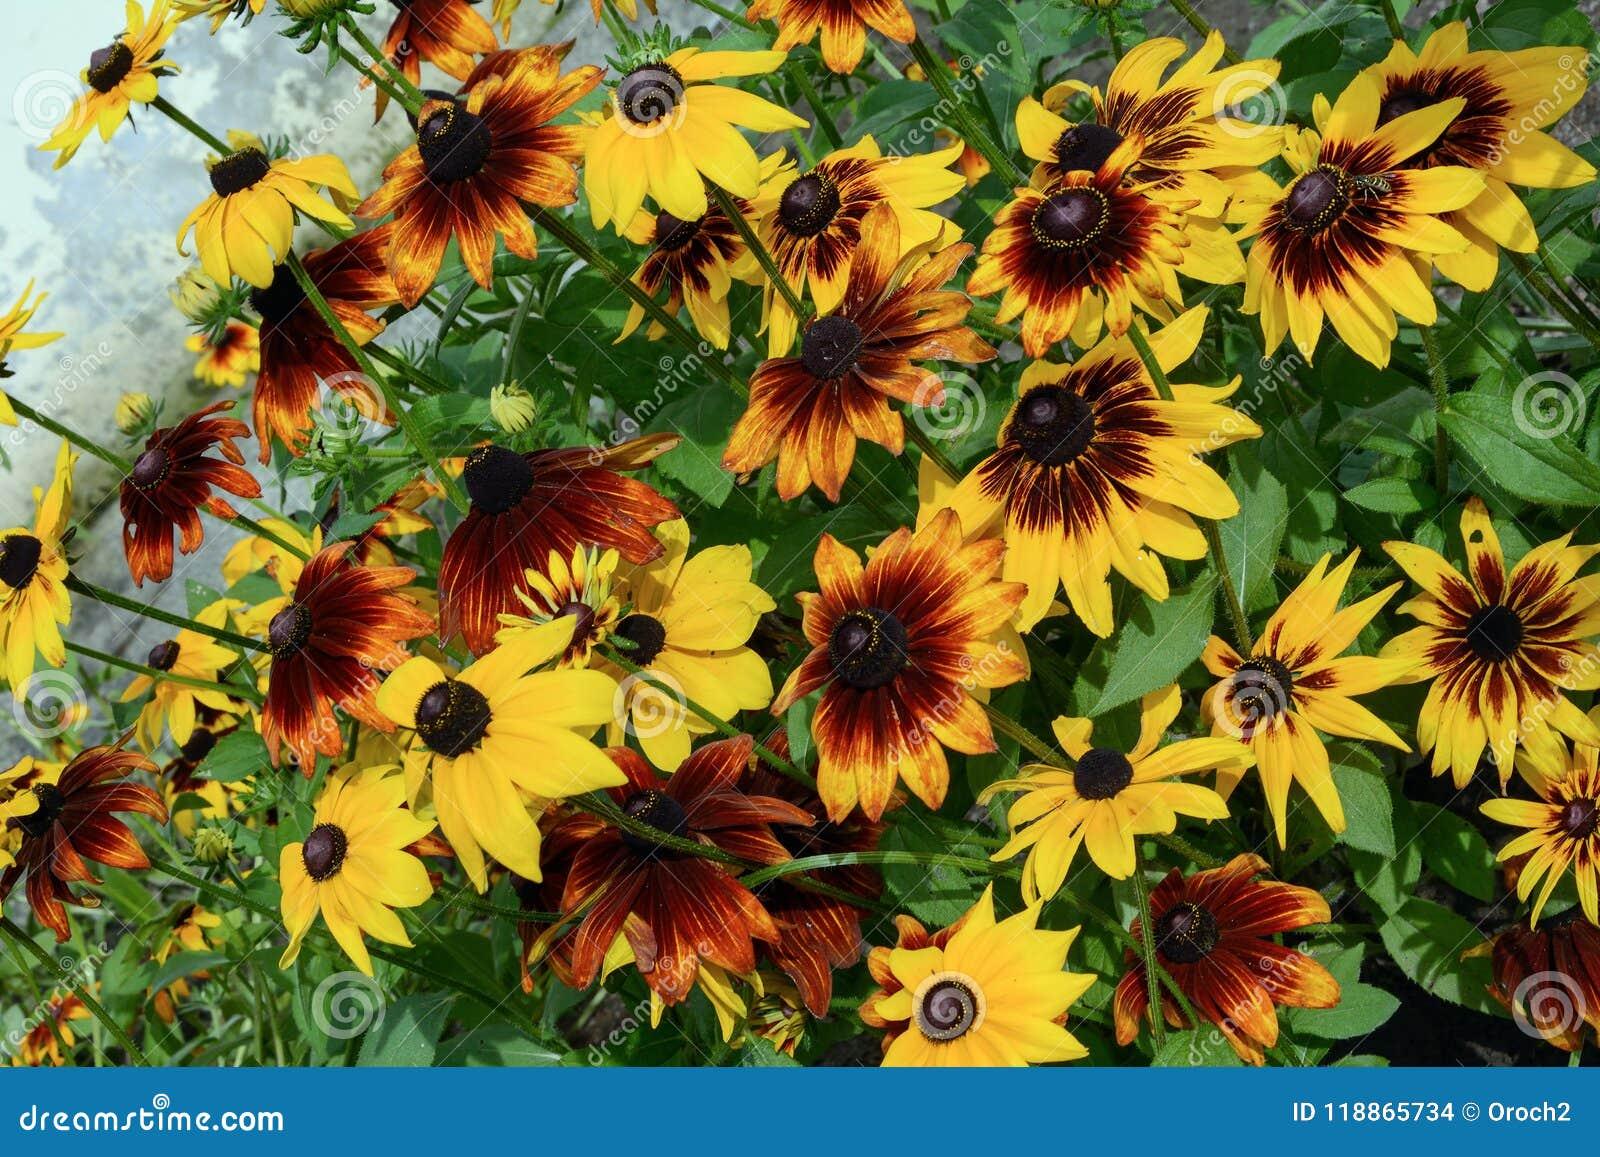 Beautiful Garden Flowers Rudbeckia Stock Photo Image Of Summer